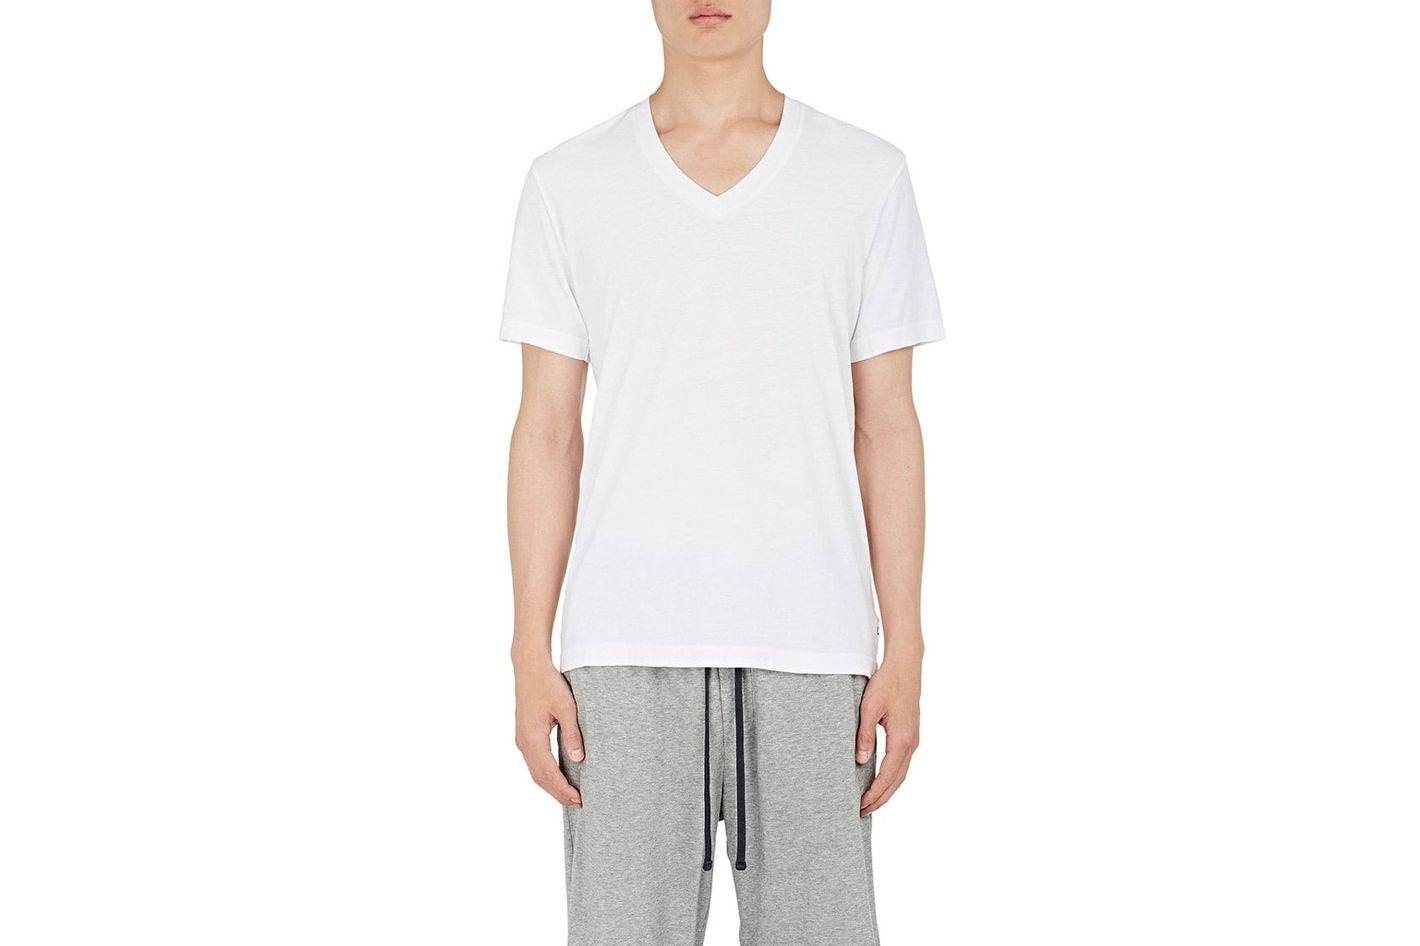 30e1554d82b50 James Perse White V-Neck T-shirt at Barneys New York